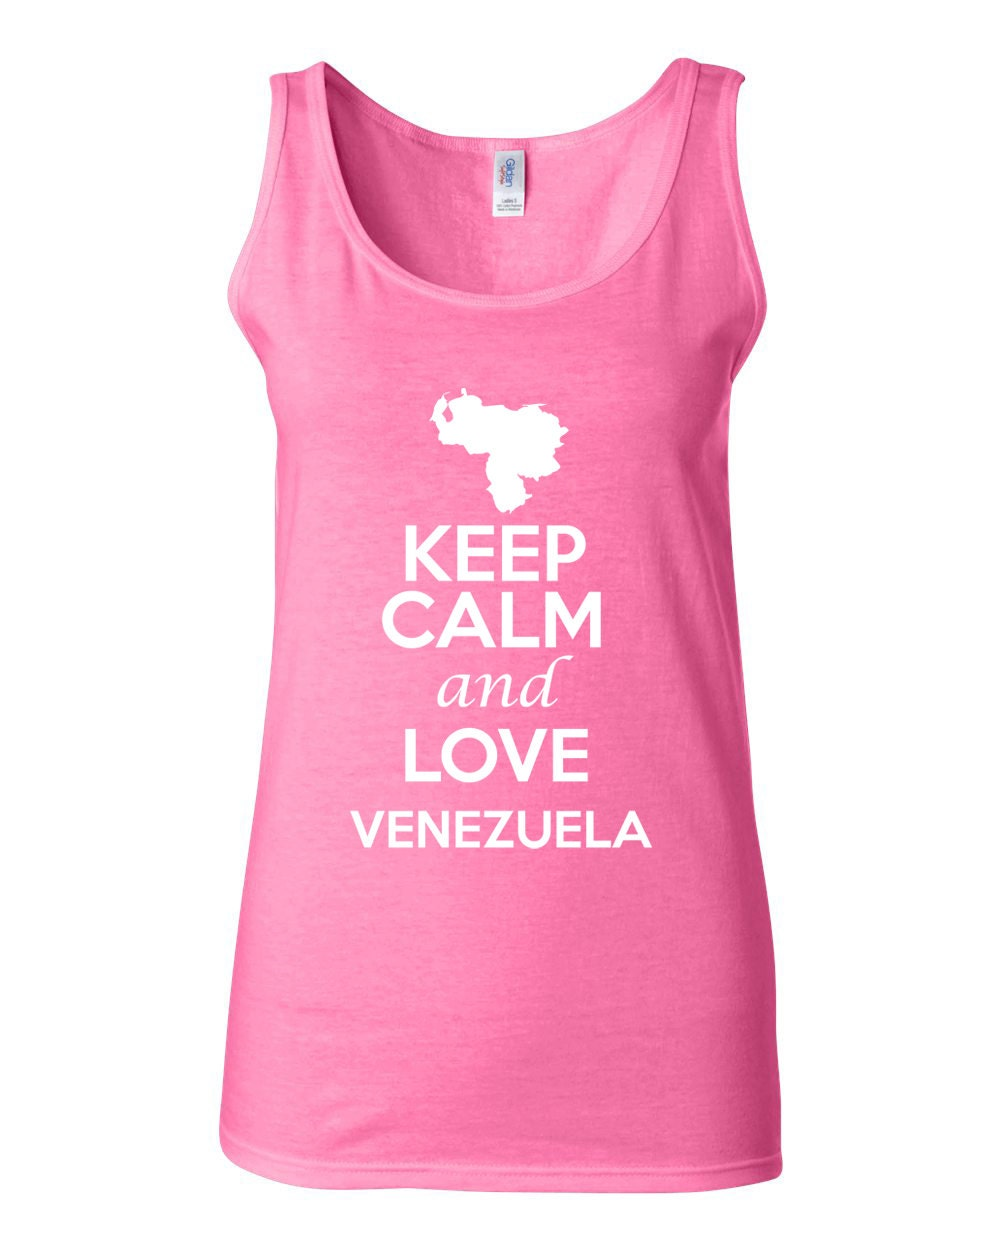 City Shirts Junior Keep Calm And Love Venezuela Novelty Statement Sleeveless Tank Top 1055